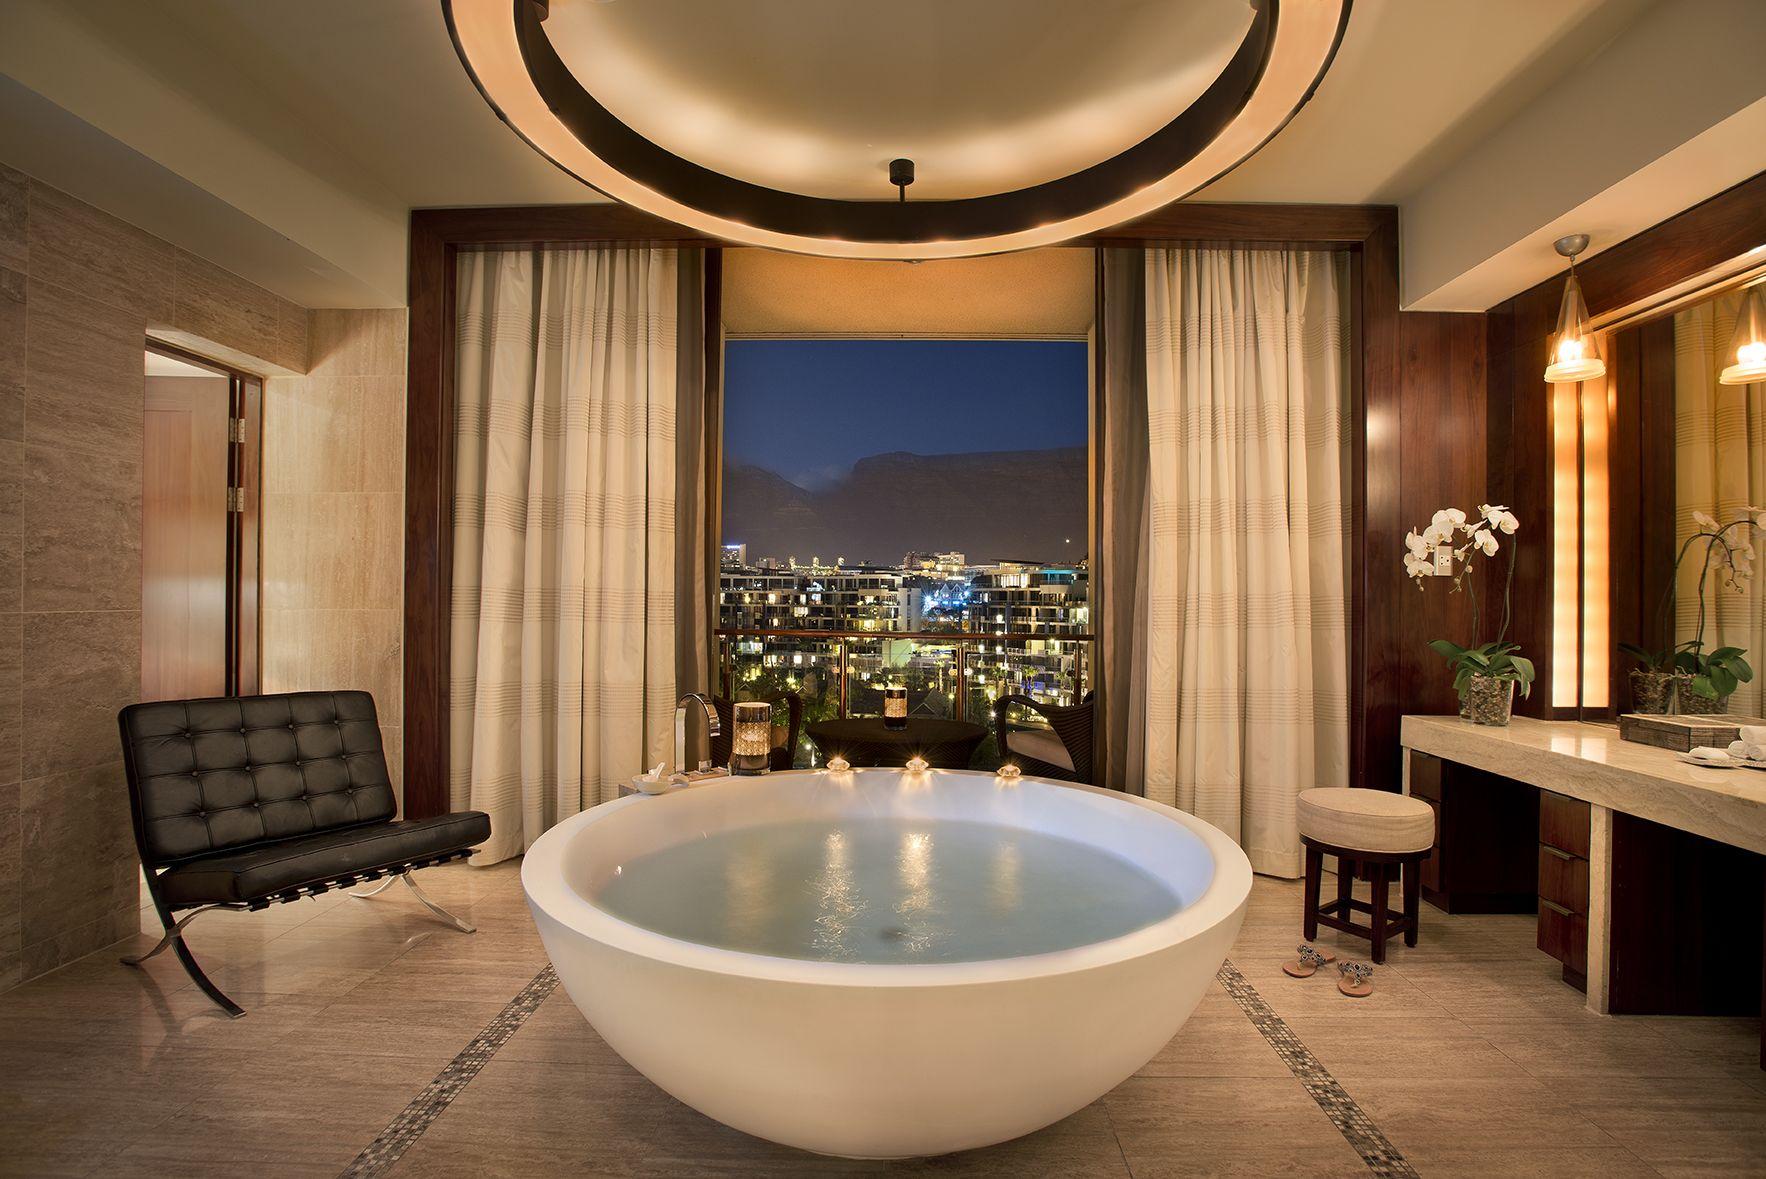 World S Best Luxury Bathrooms Bathroom Design Inspiration Bathroom Design Luxury Amazing Bathrooms